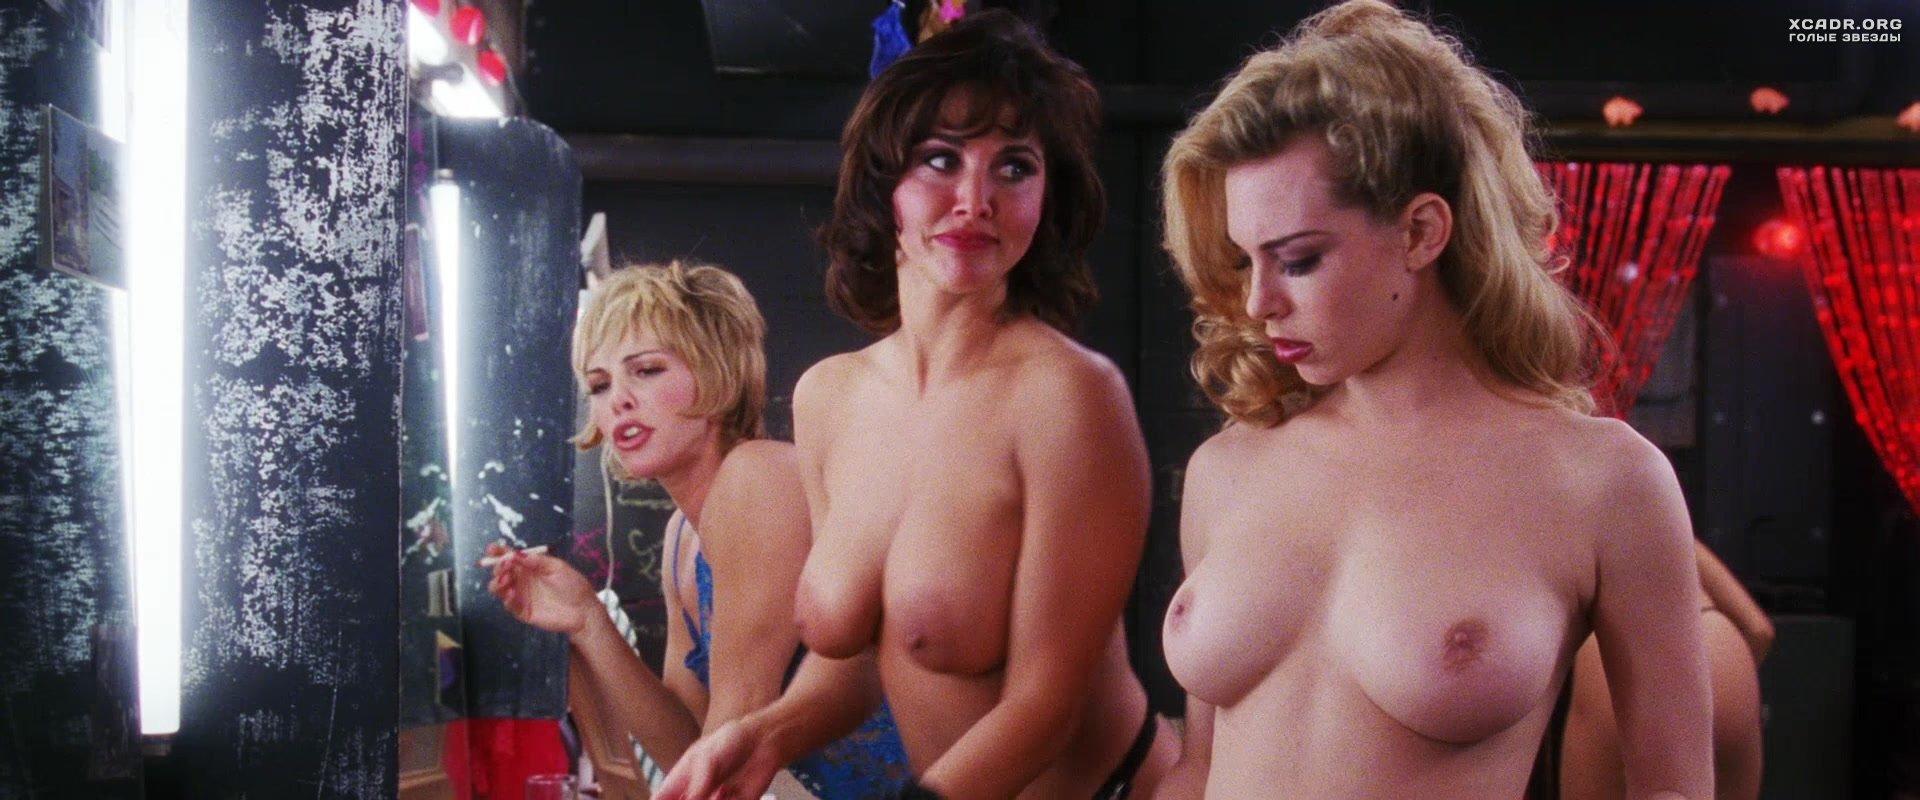 Nude bobbie phillips